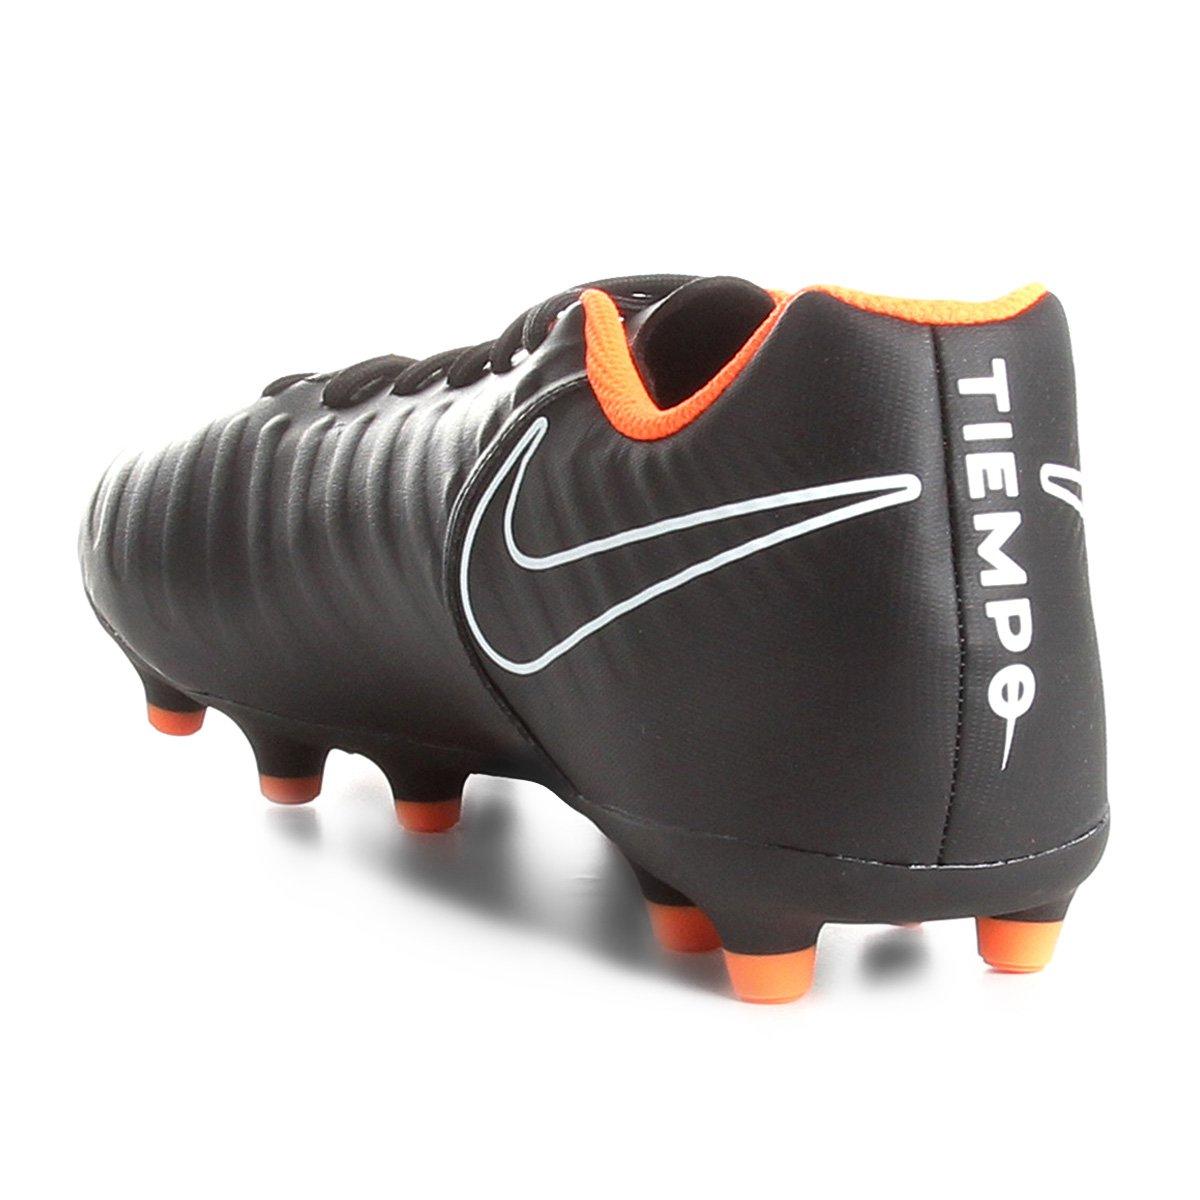 Chuteira Campo Nike Tiempo Legend 7 Club FG - Preto e Laranja ... 8616ba7b1da7f